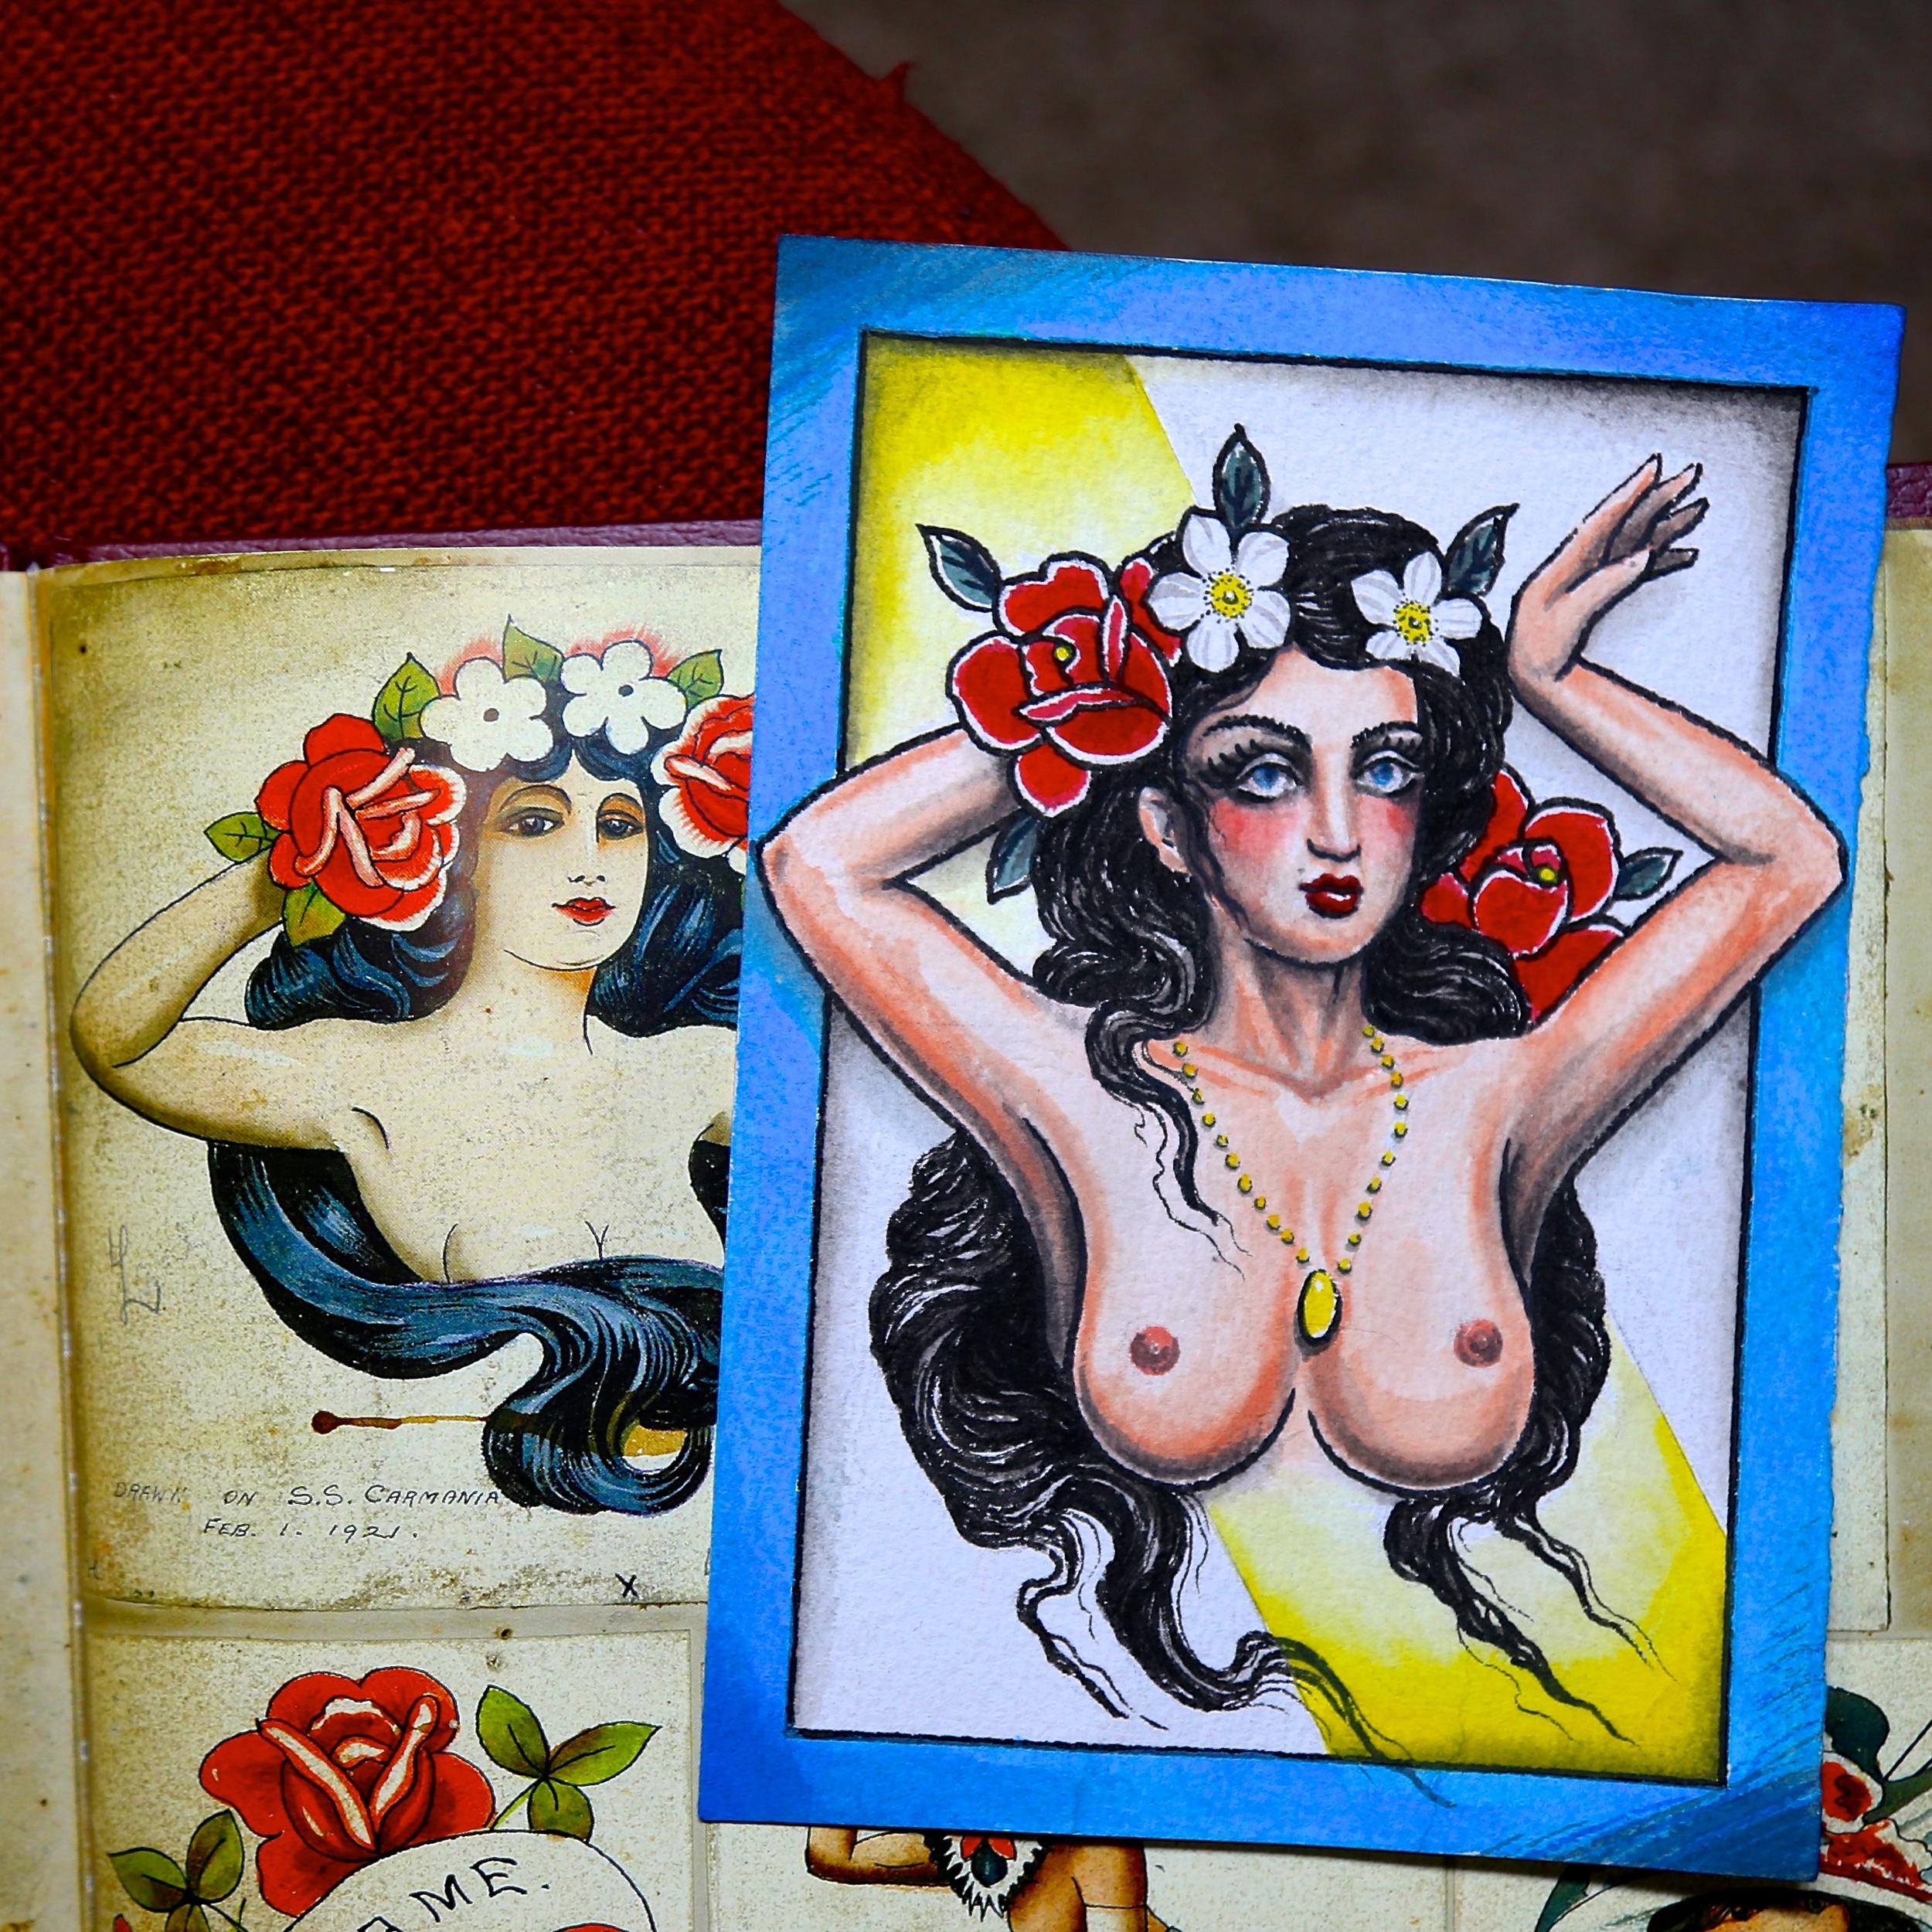 Painting enrique bernal ejay tattoo.JPG